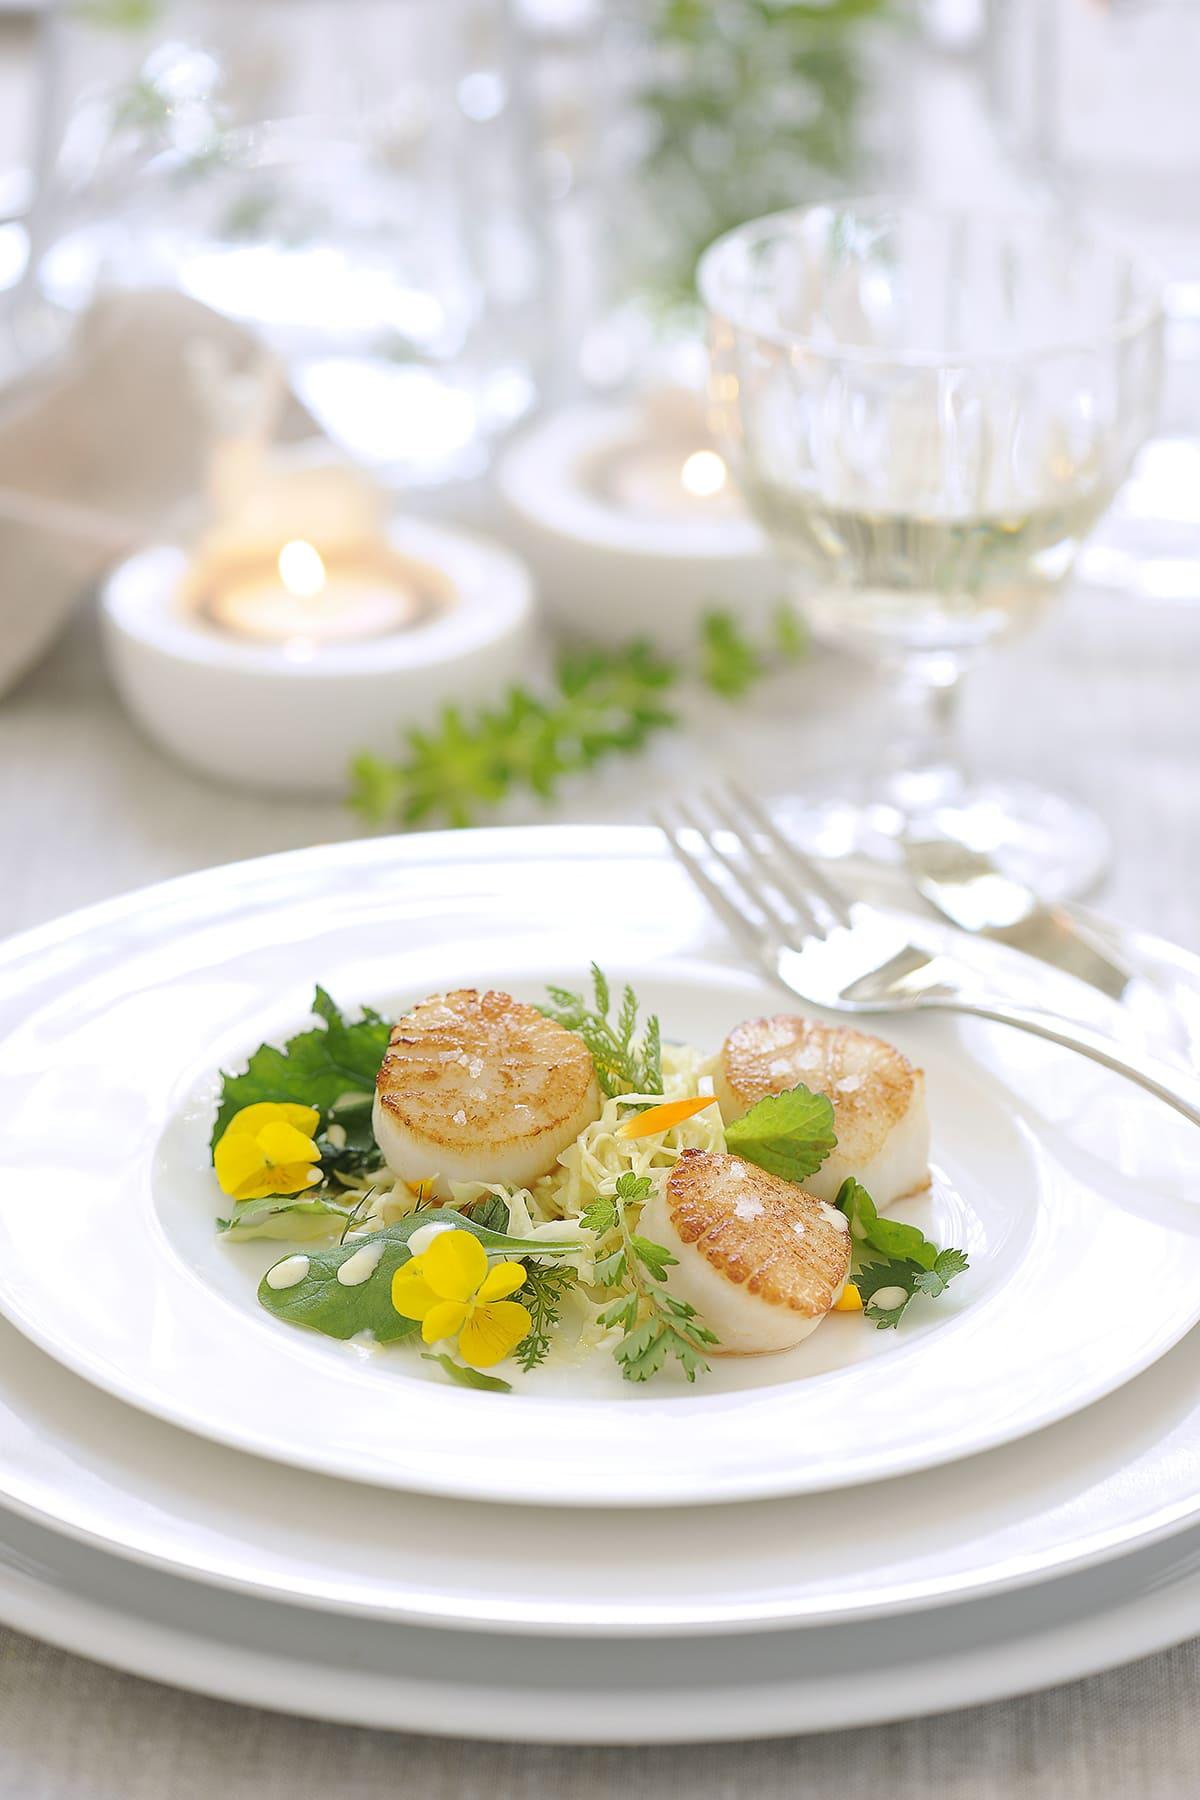 Jacobsmuschel von Antje Plewinski Foodfotografie